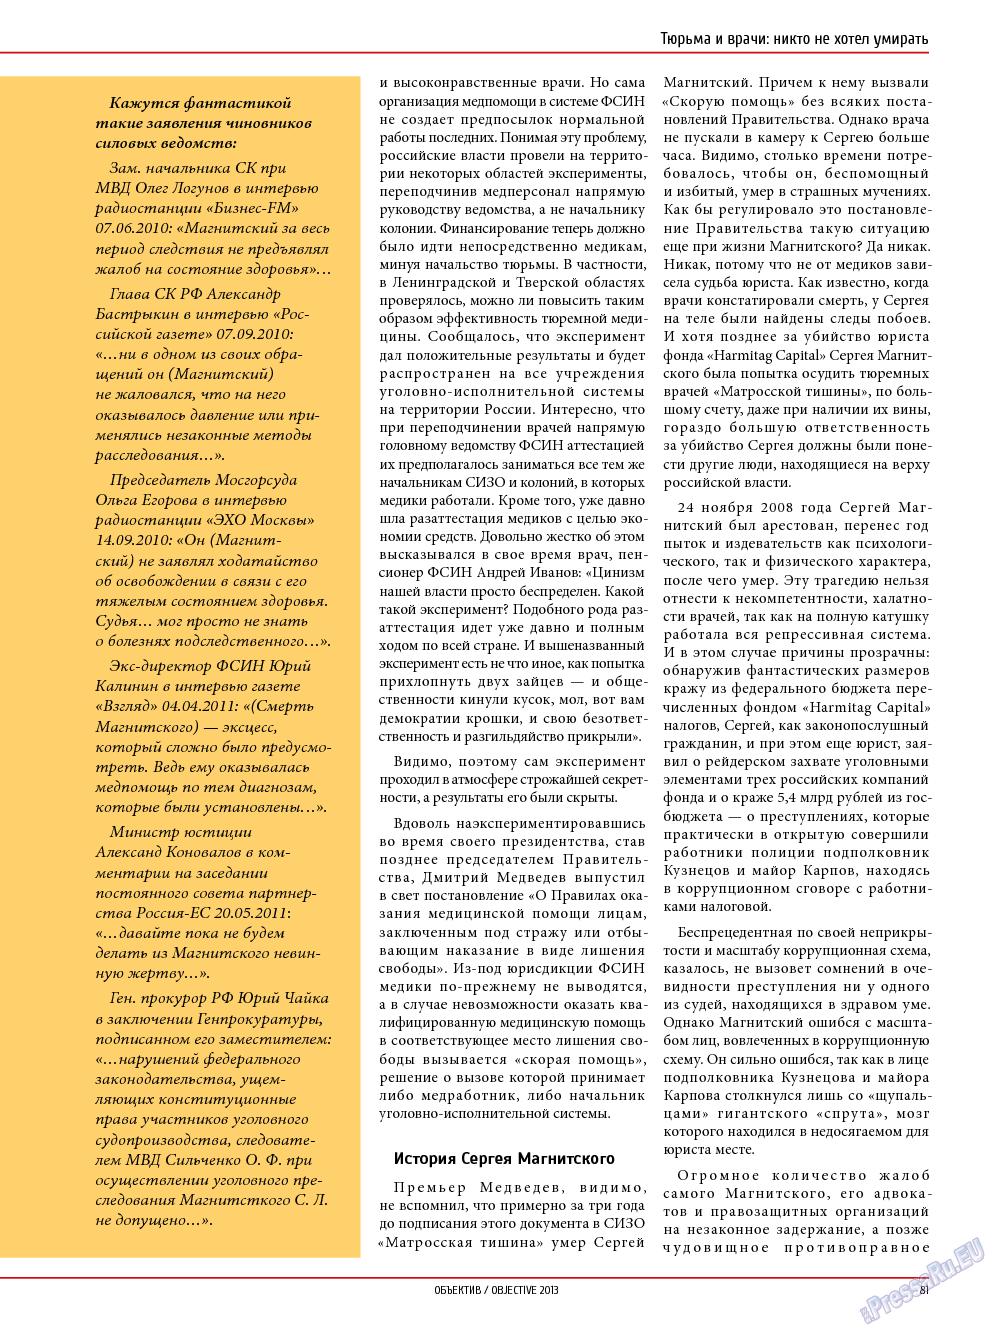 Объектив EU (журнал). 2013 год, номер 5, стр. 81